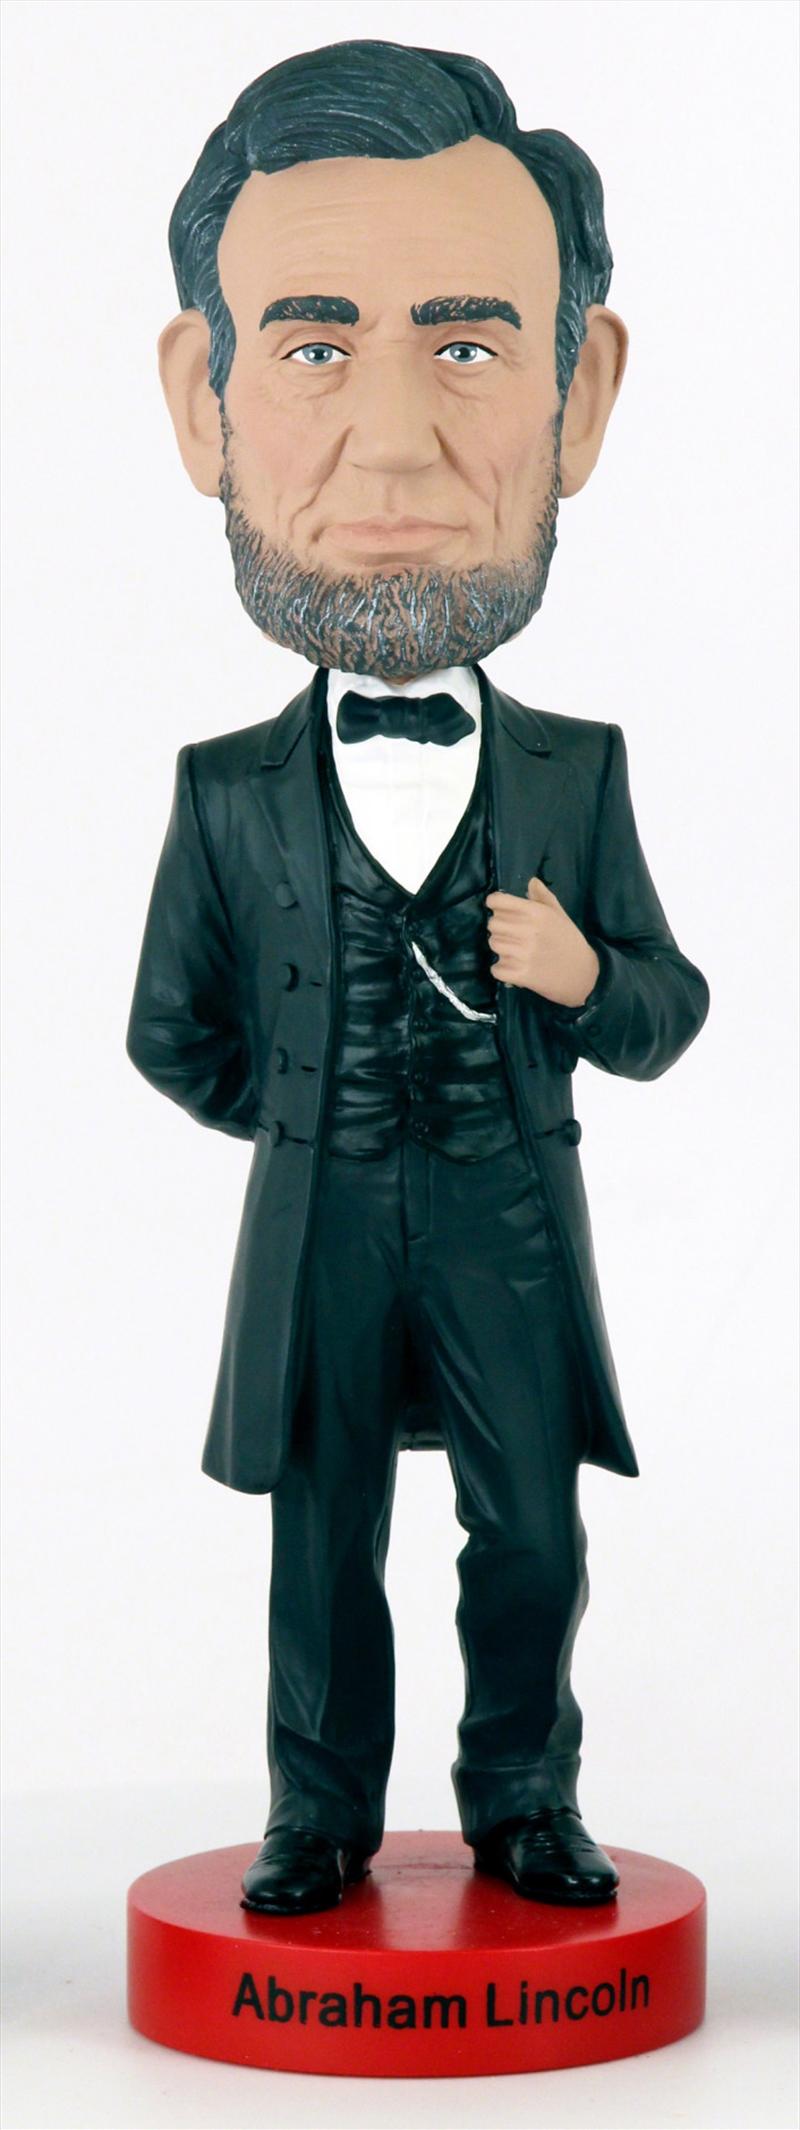 Bobblehead Abraham Lincoln Version 2 | Merchandise